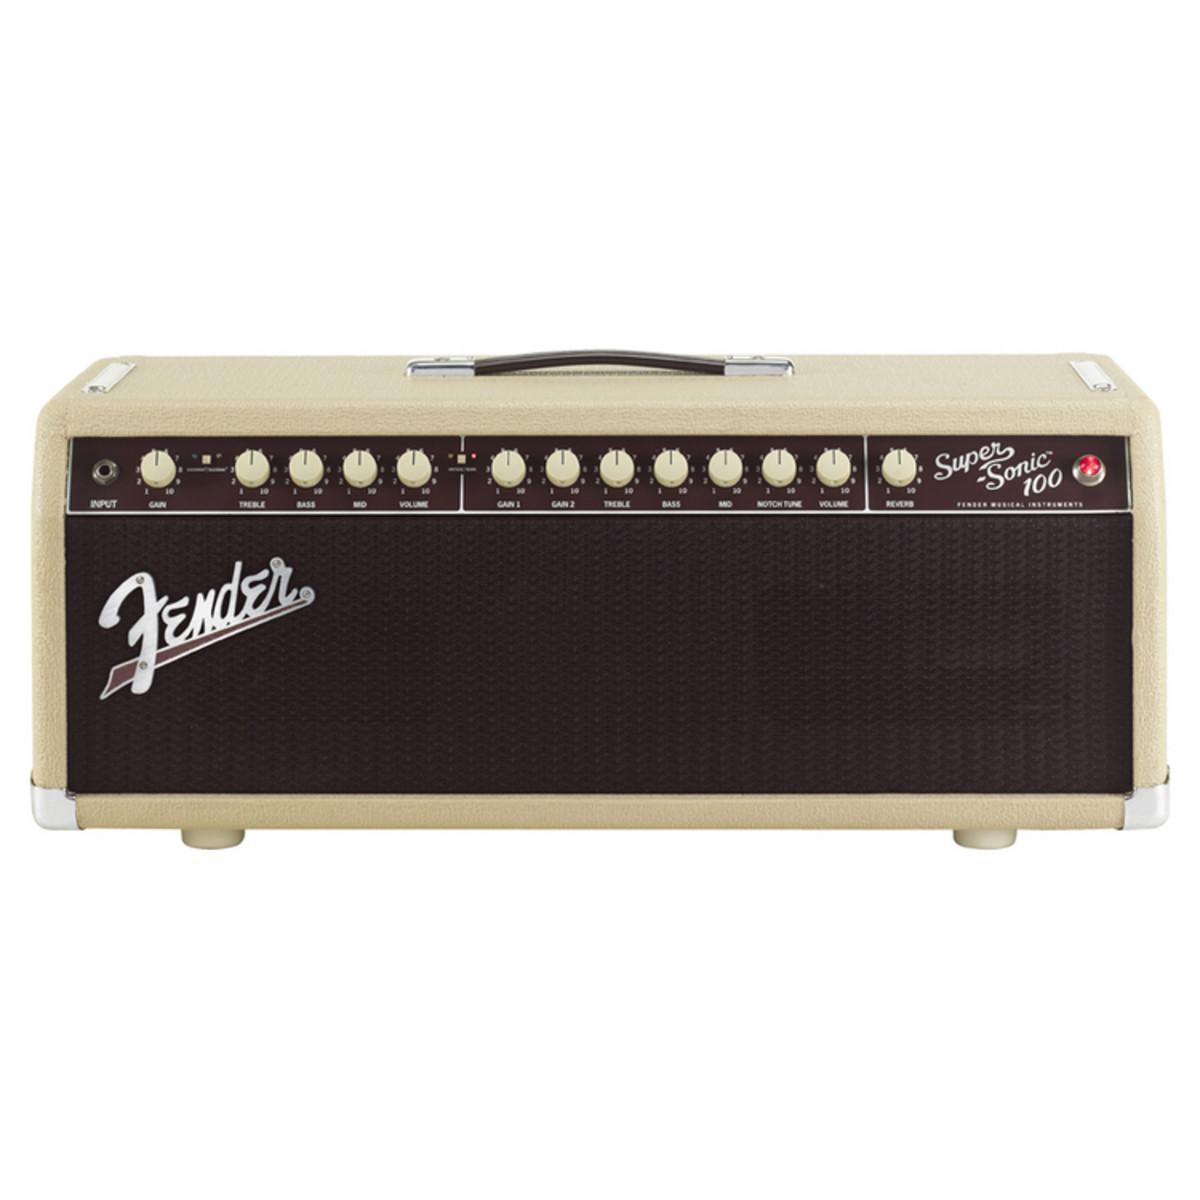 fender super sonic 100 watt guitar amp head at. Black Bedroom Furniture Sets. Home Design Ideas